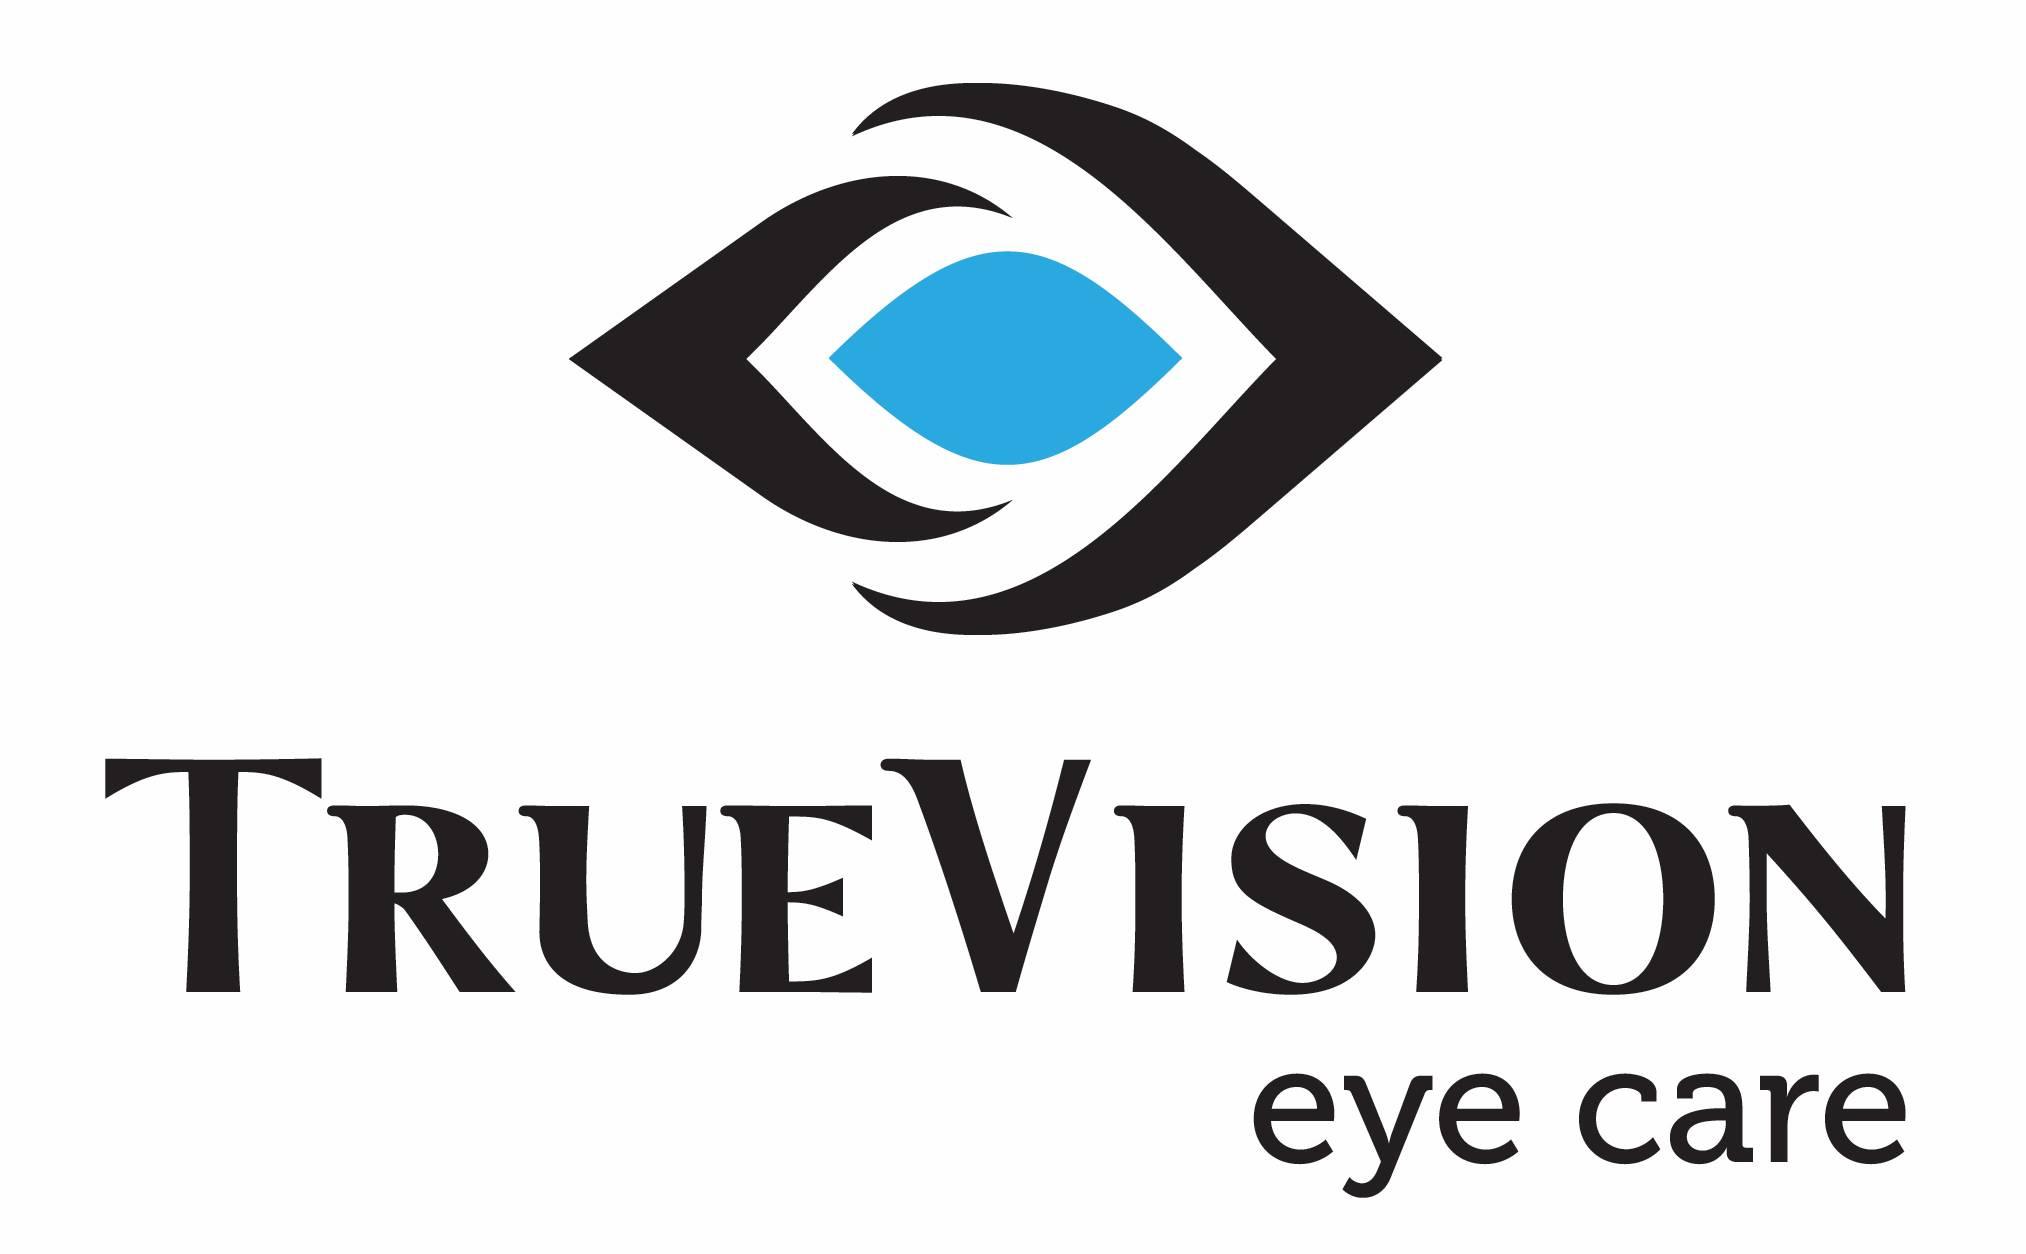 TrueVision Eye Care